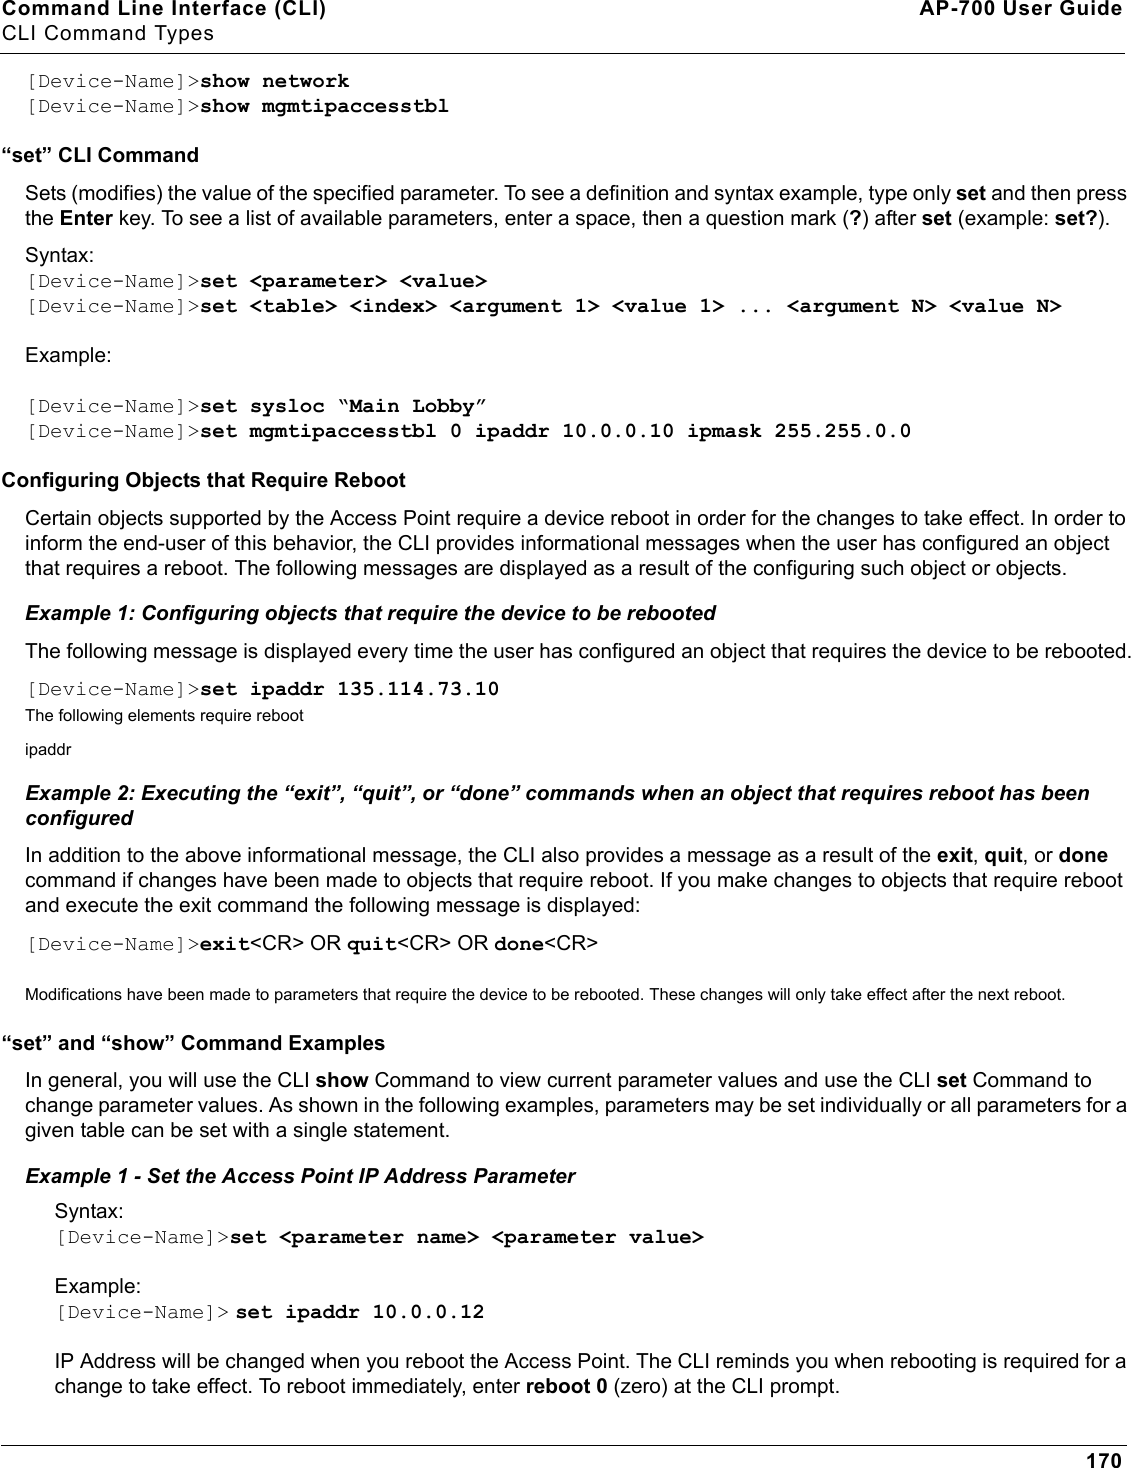 Proxim Wireless AP700 Wireless Access Device User Manual APs UG